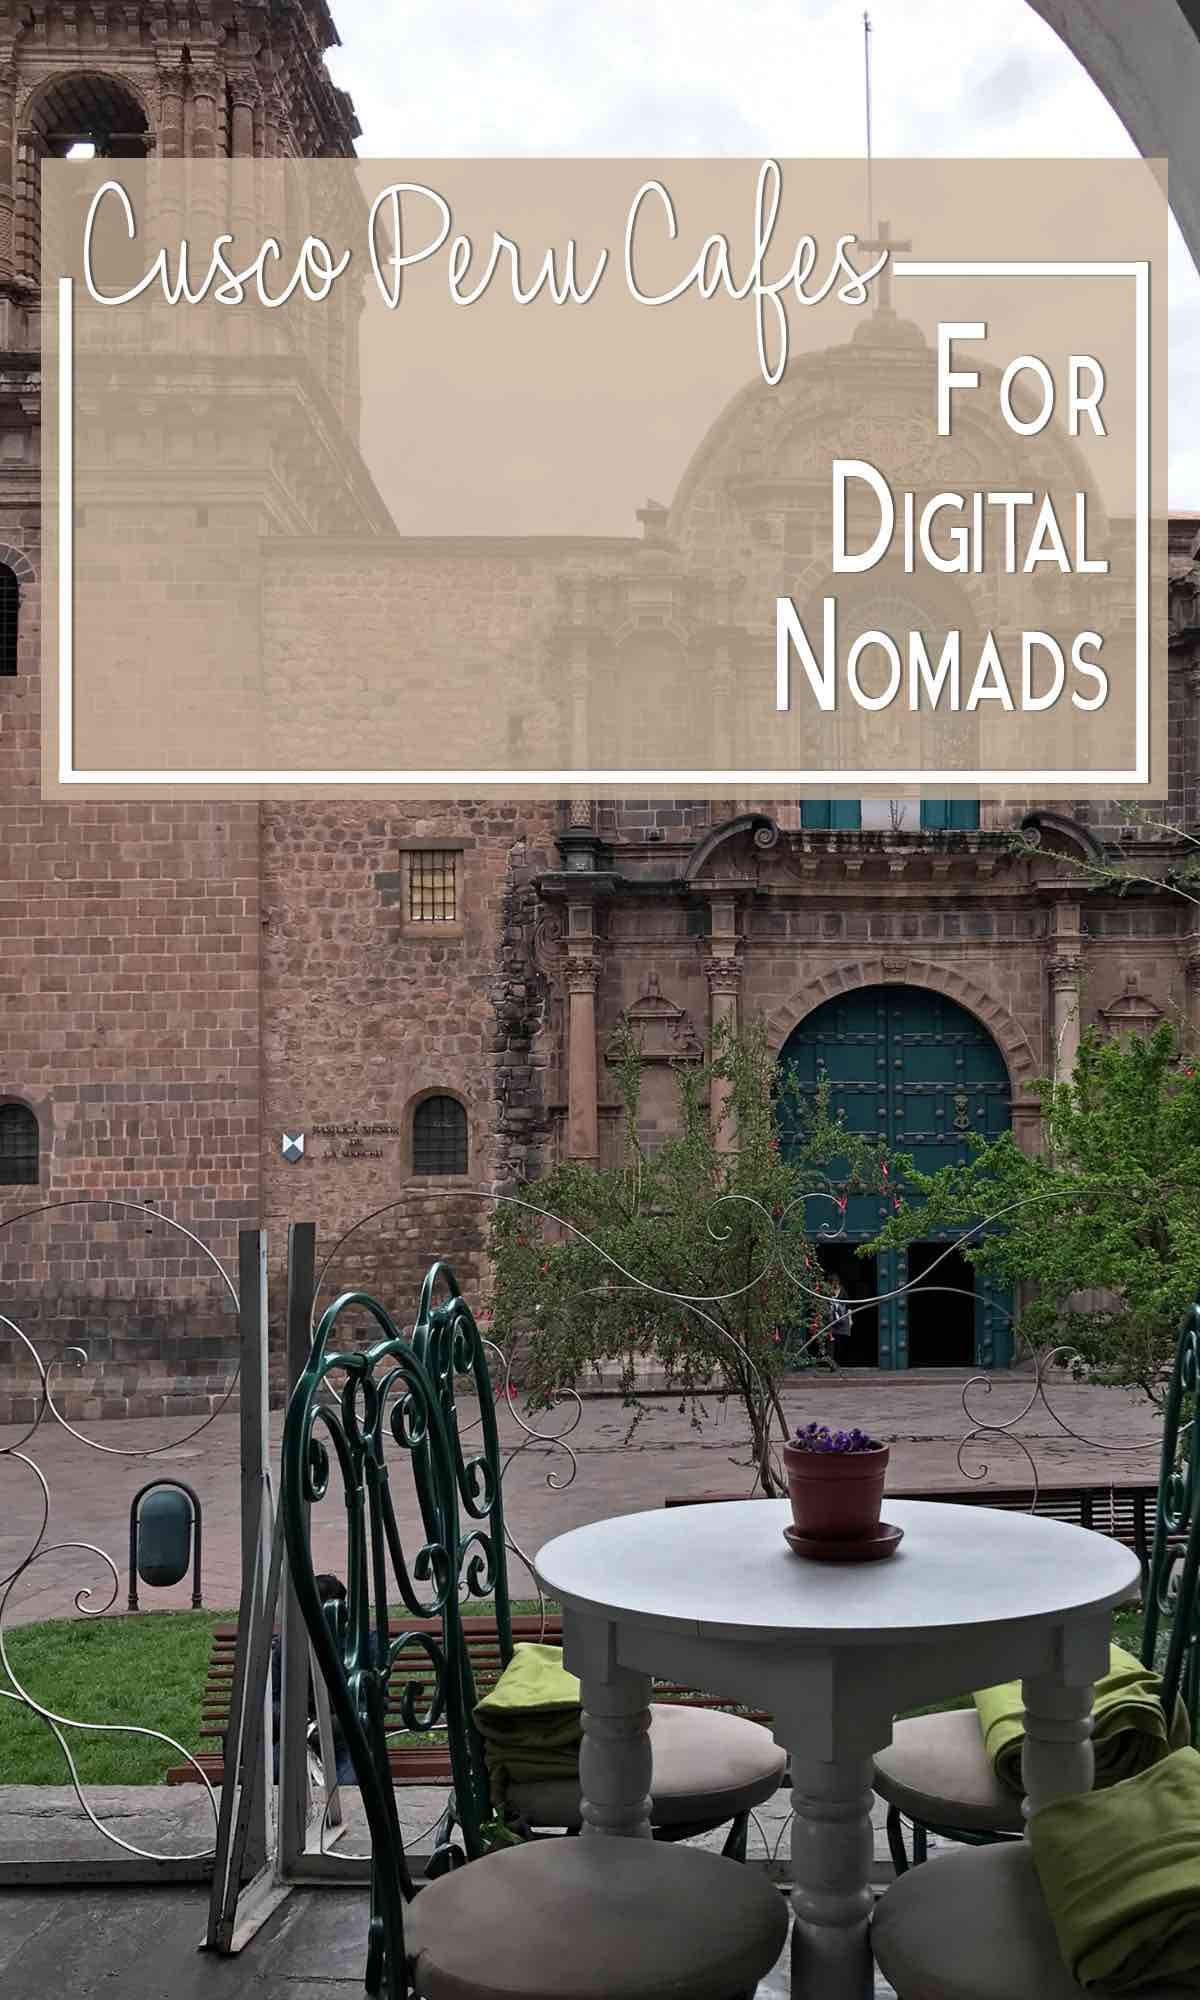 Cusco Peru cafes for digital nomads